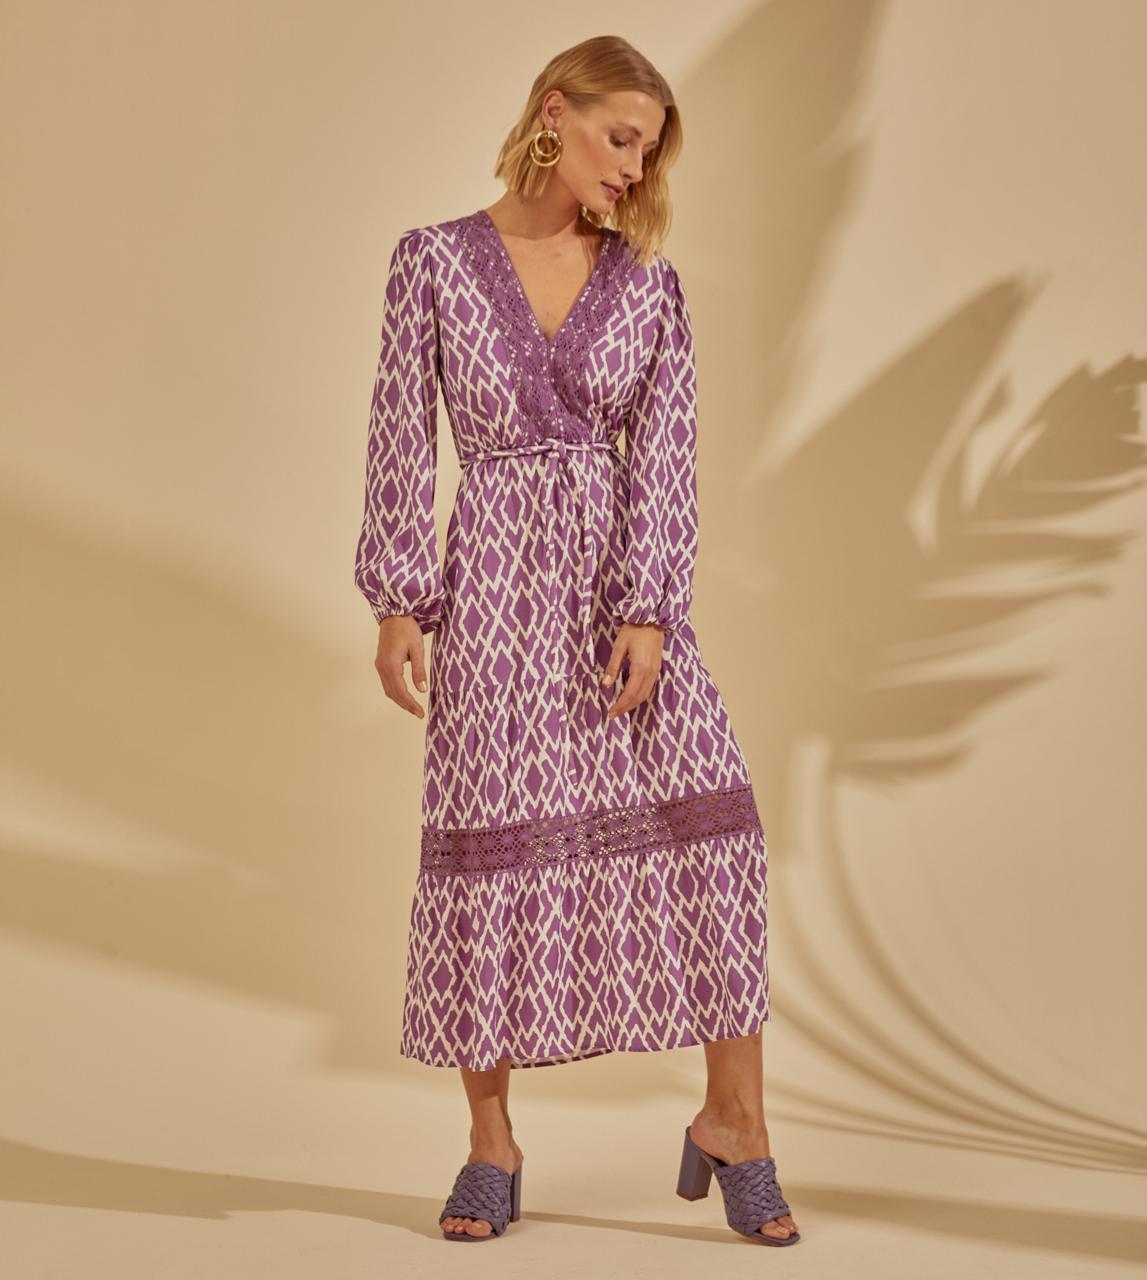 Vestido Silvia Viscose Print Detalhe Decote Renda